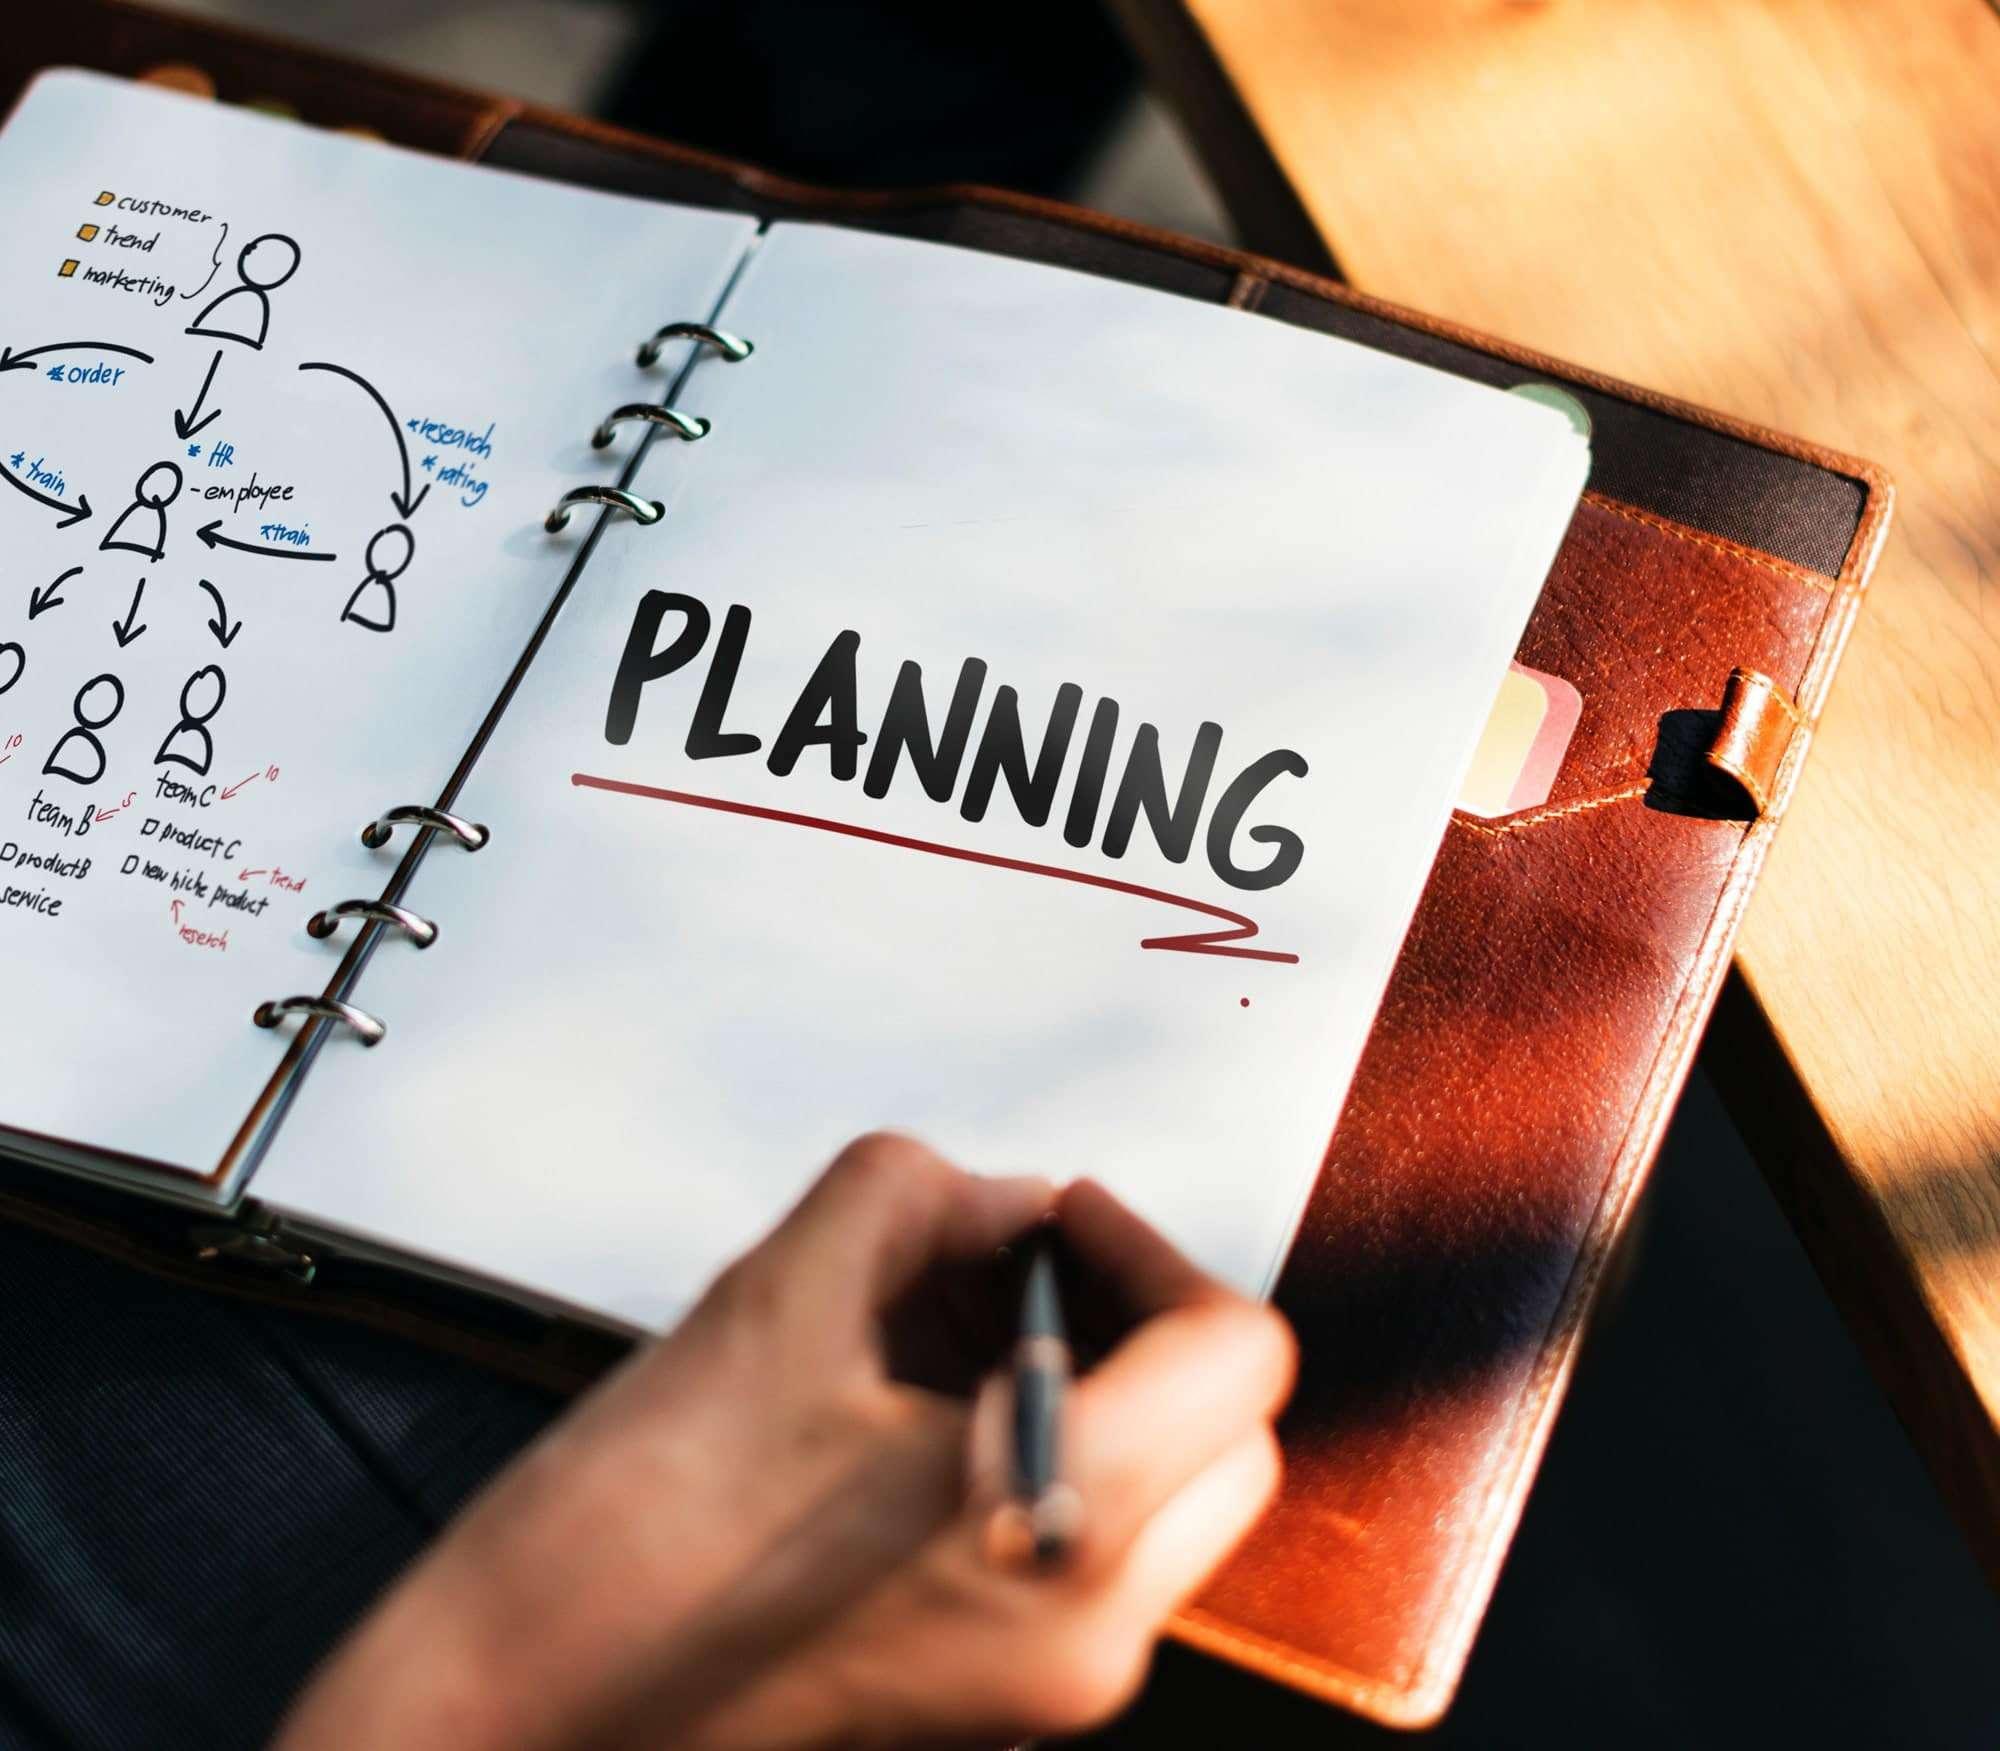 Planning in an organiser